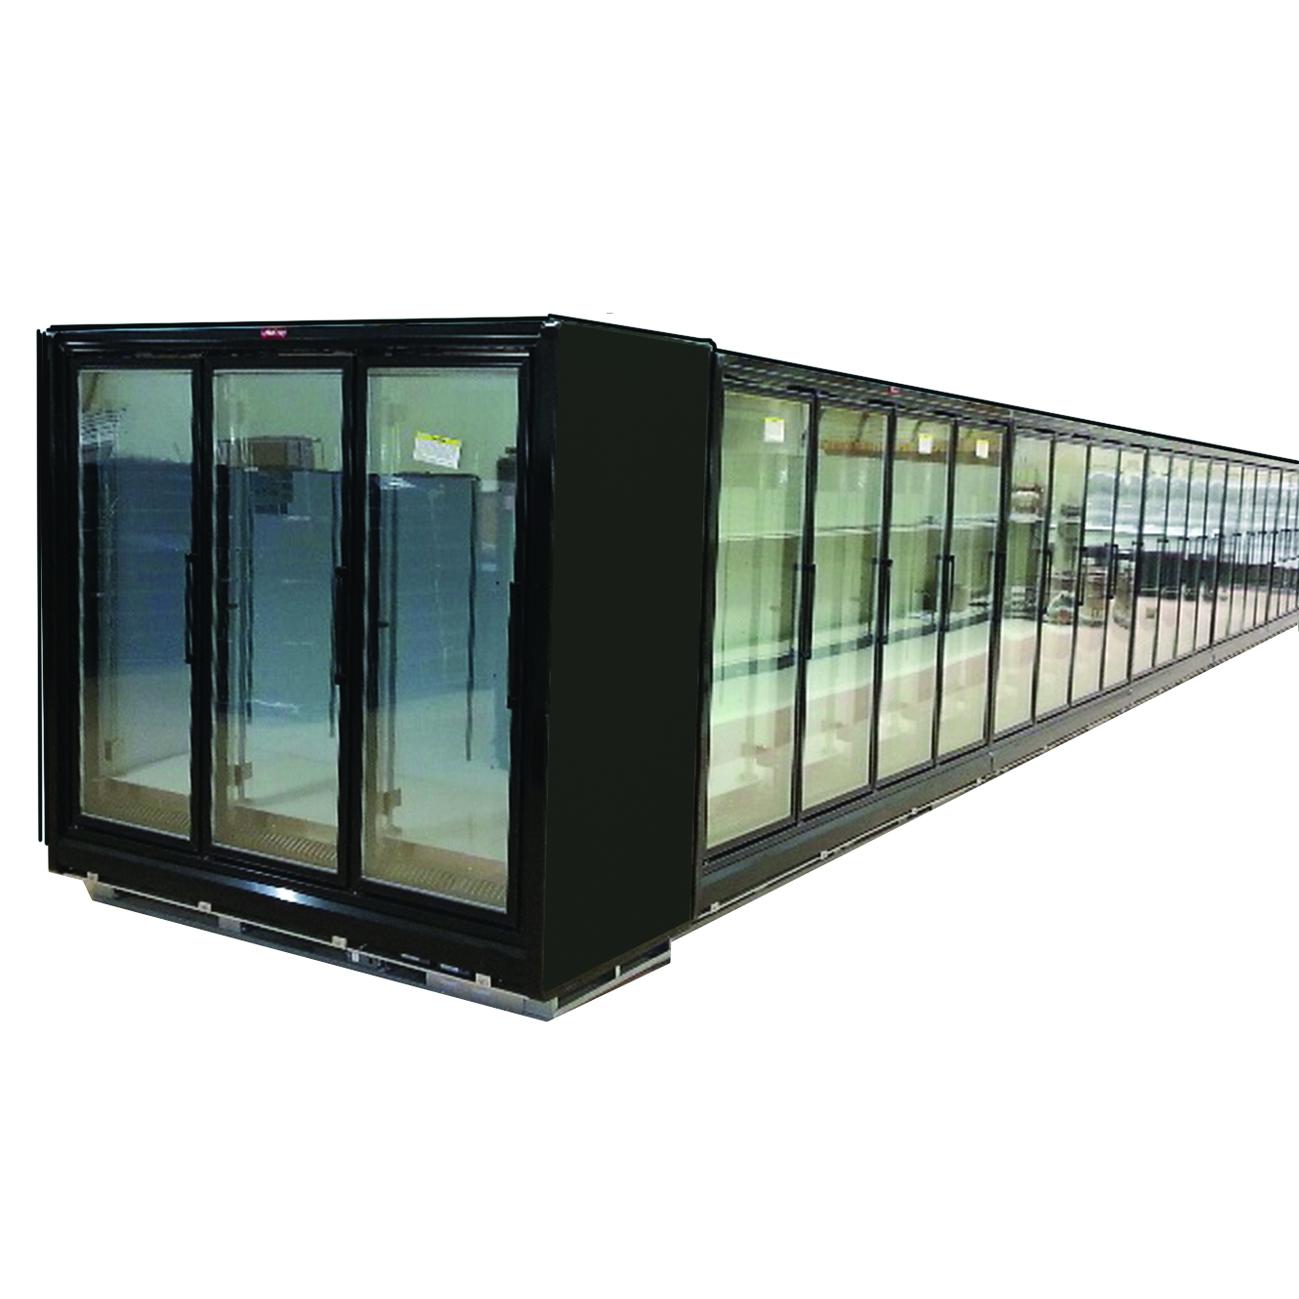 Howard-McCray RIN4-30-LED-B refrigerator, merchandiser